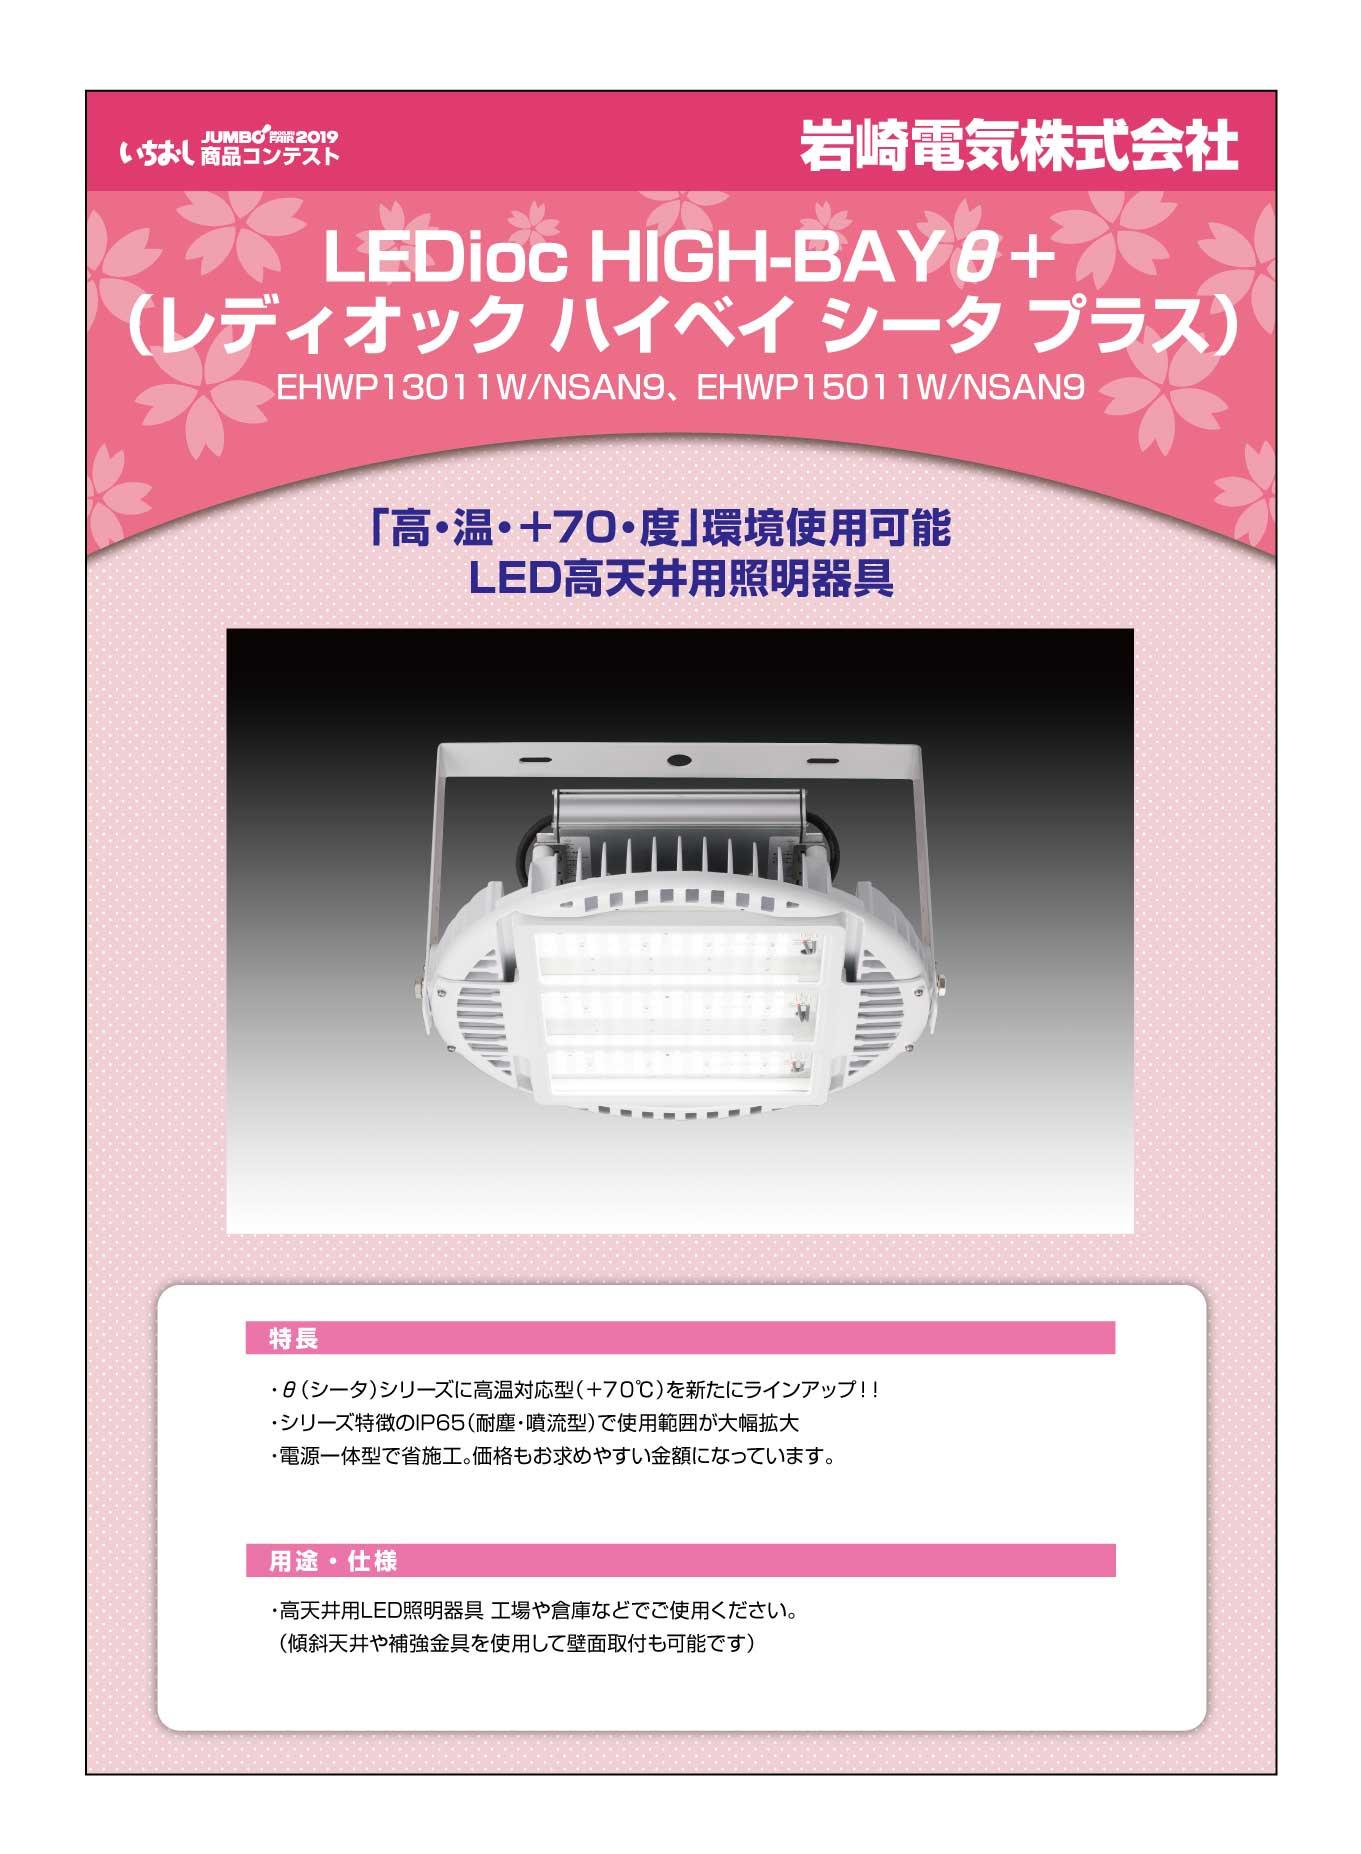 「LEDioc HIGH-BAYθ+」岩崎電気株式会社の画像